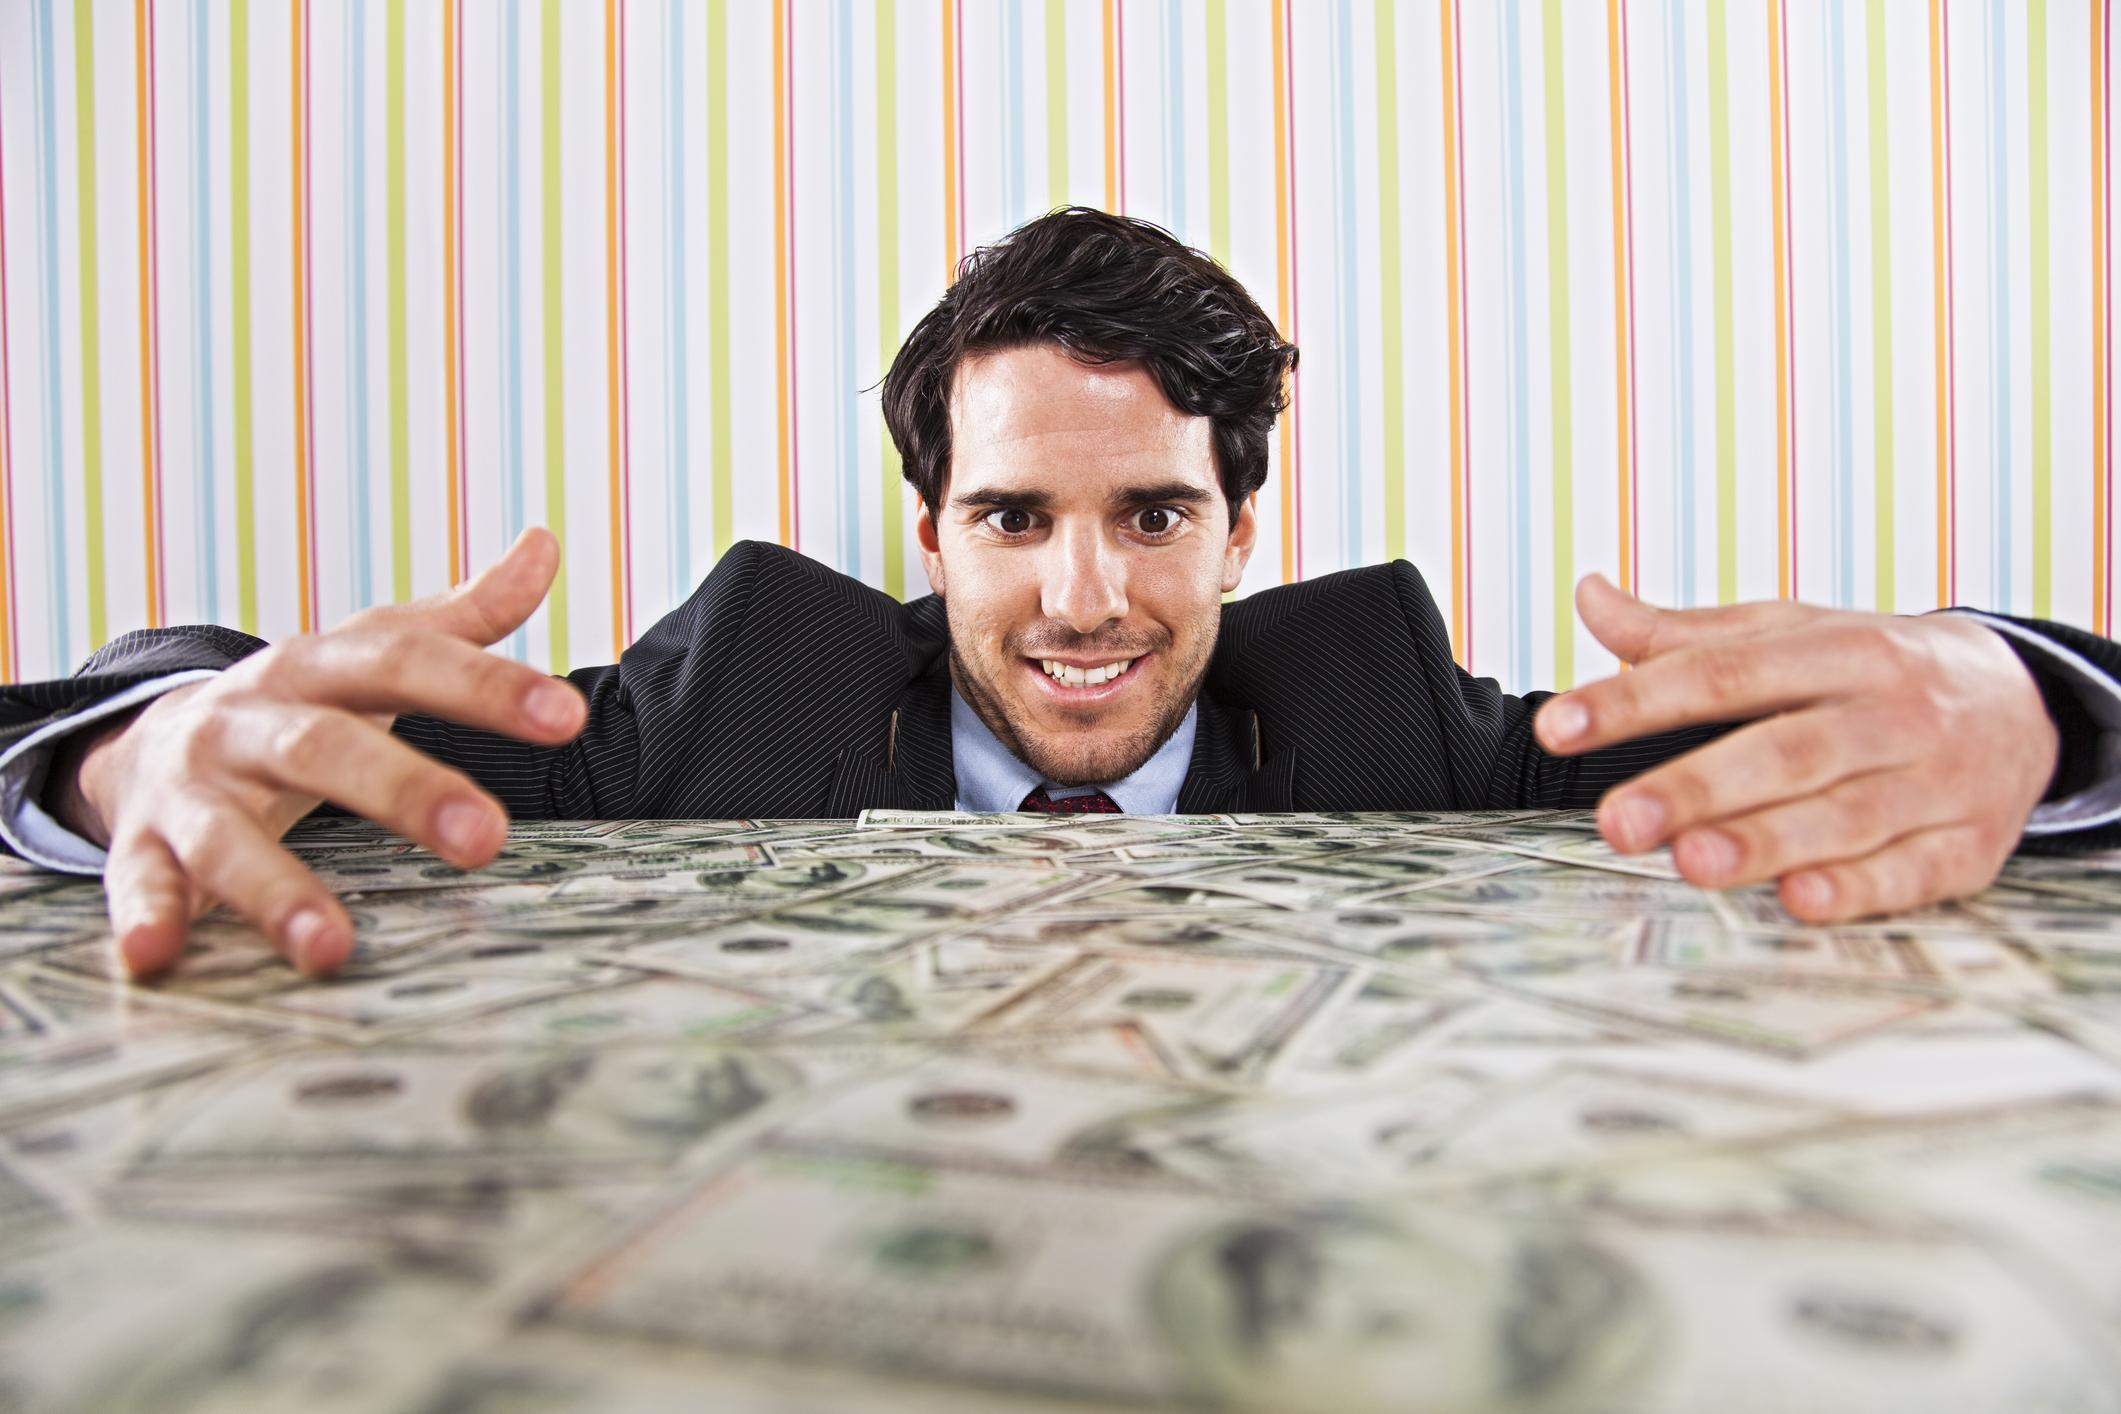 An investor marveling at cash on his desk.